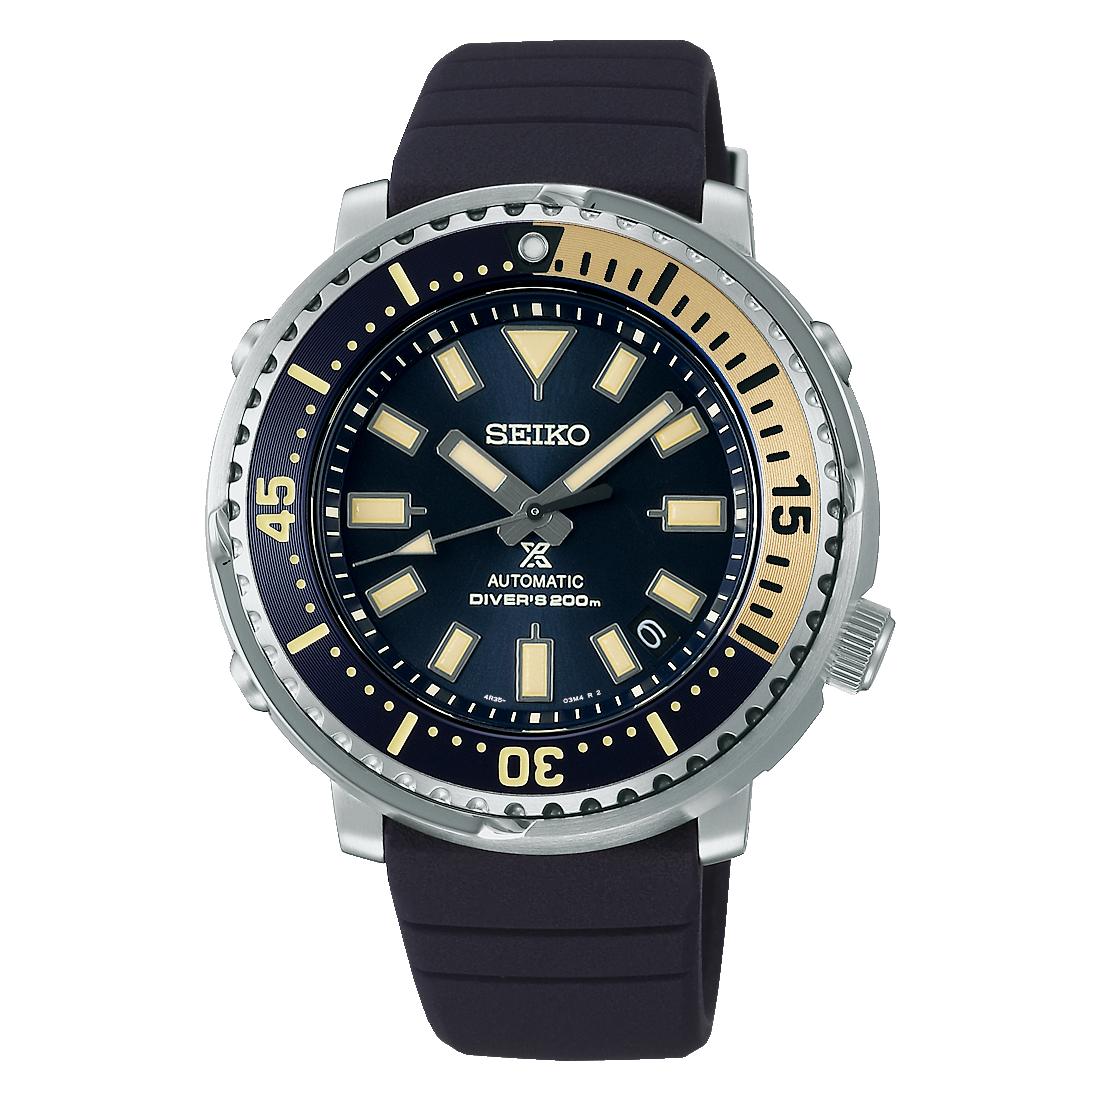 Orologio Seiko Prospex SRPF81 K1